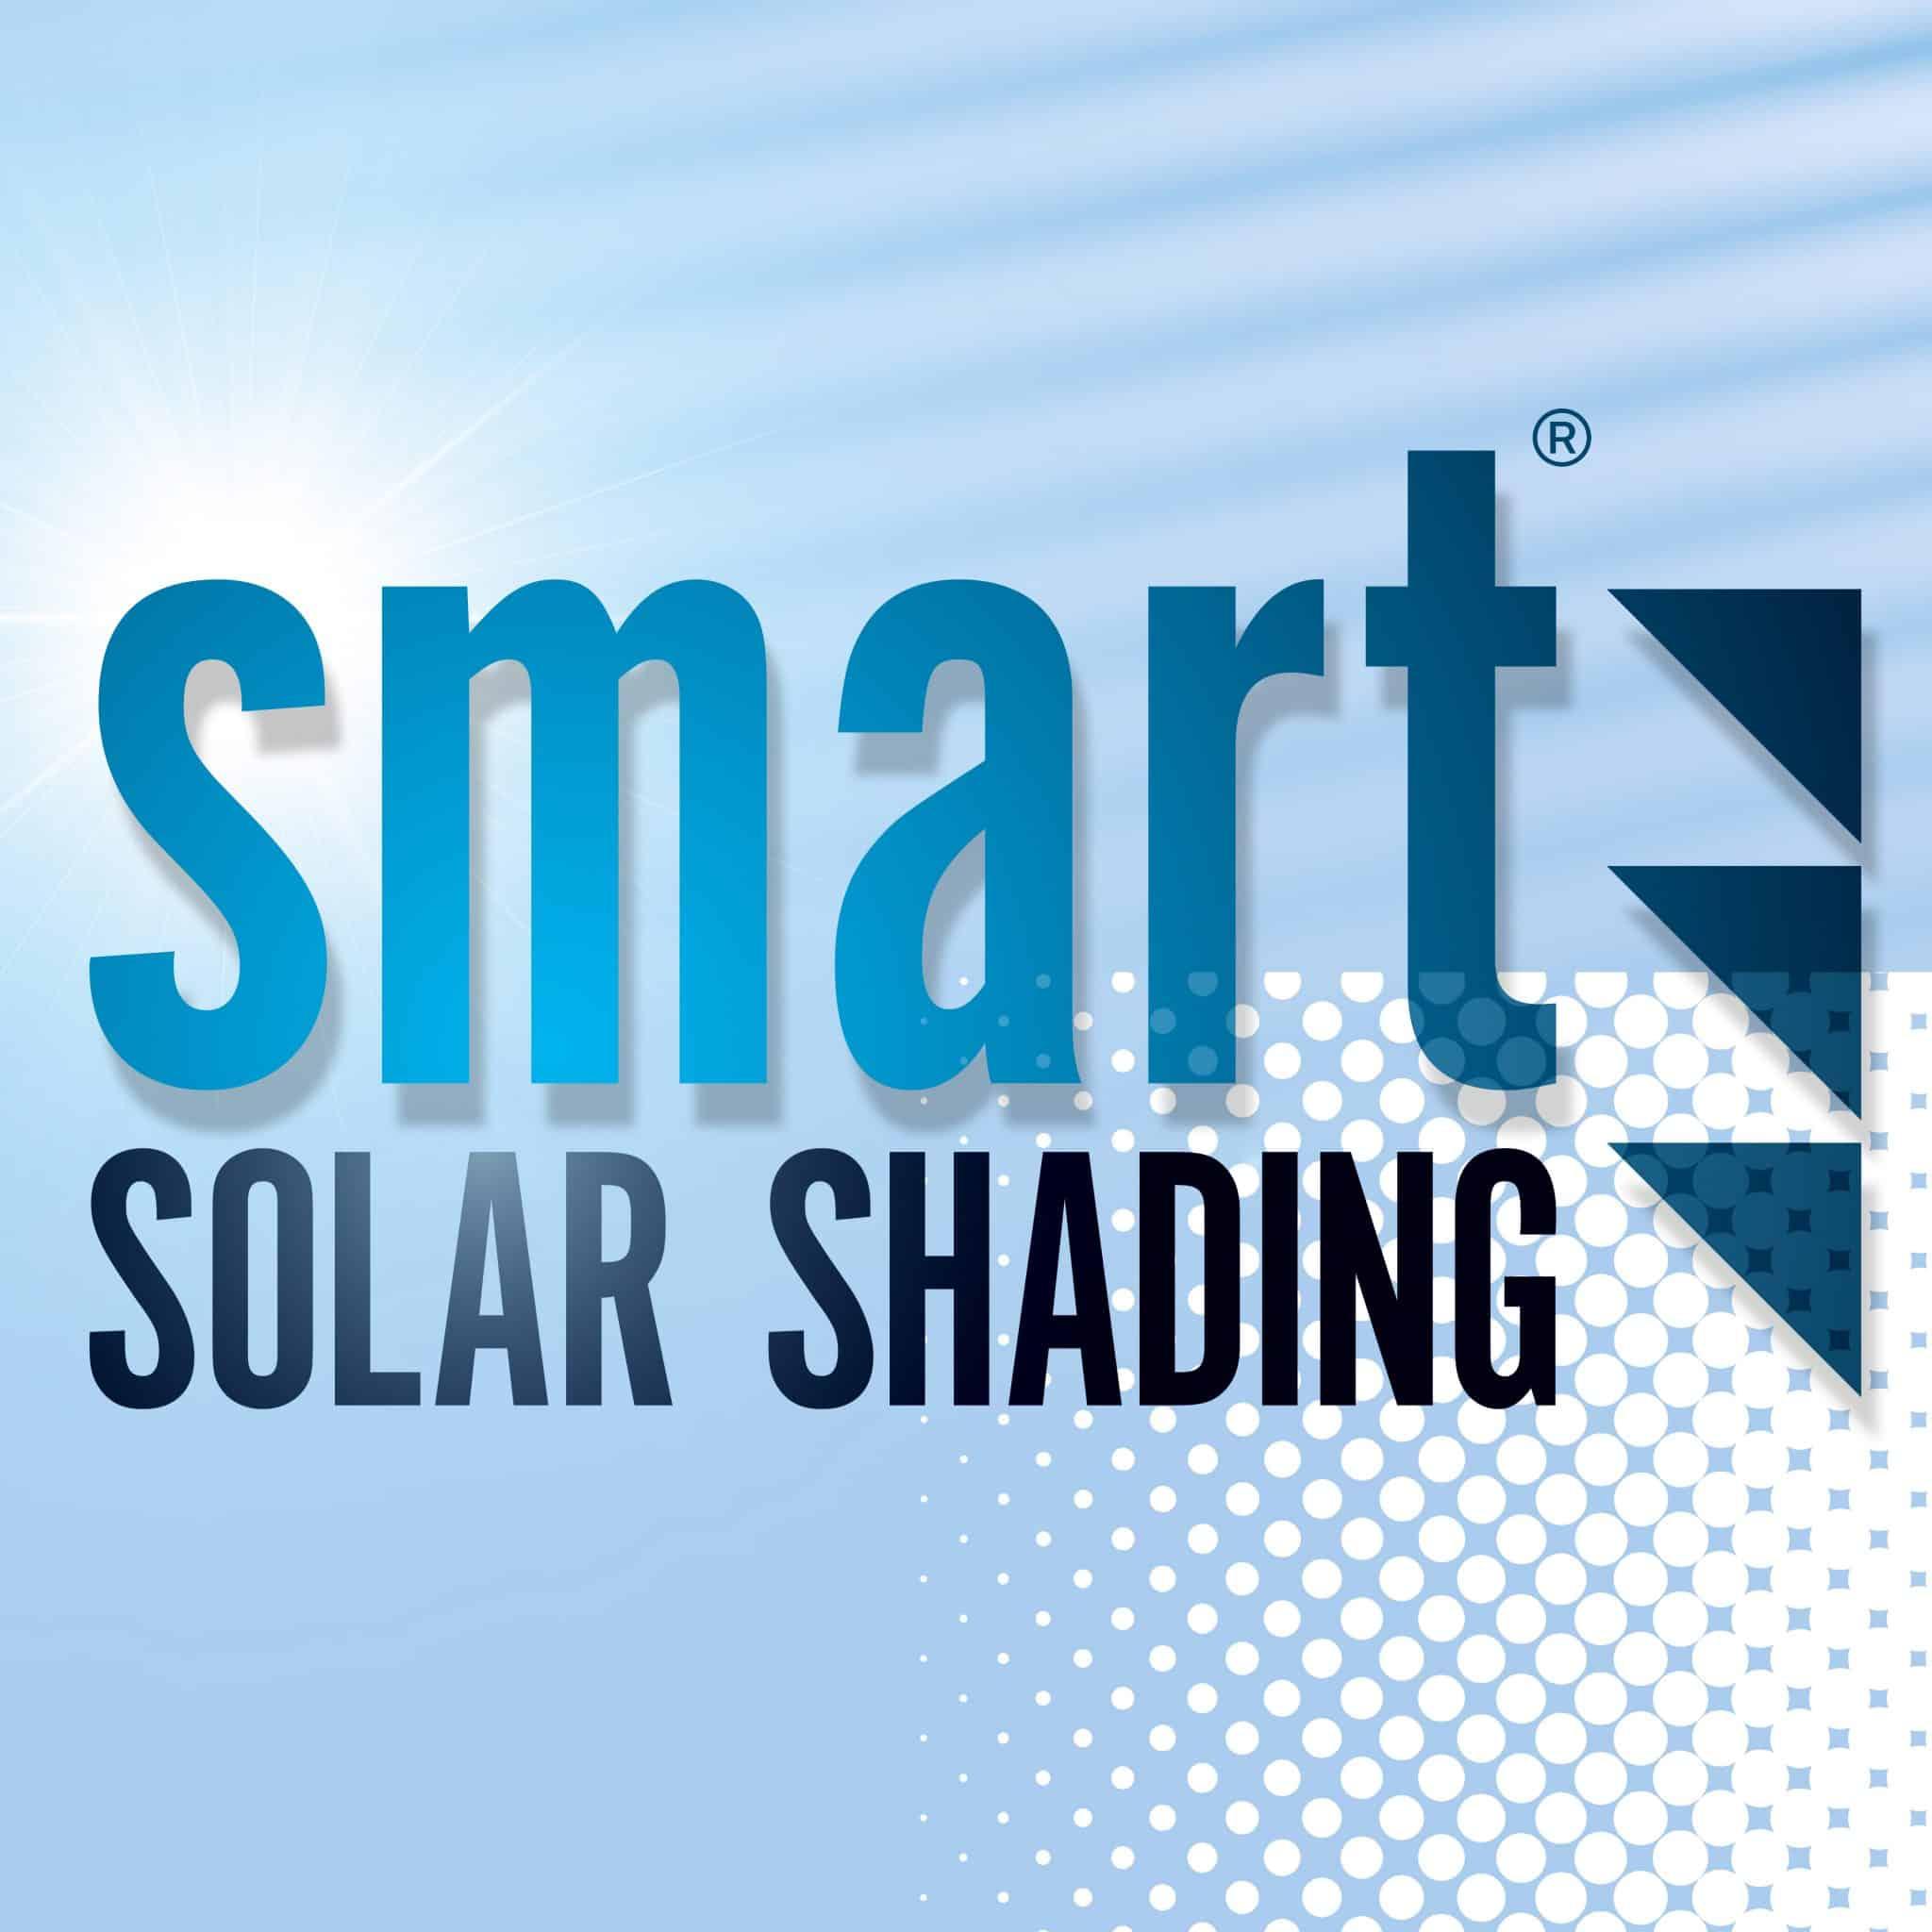 European Solar Shading Organisation Logo